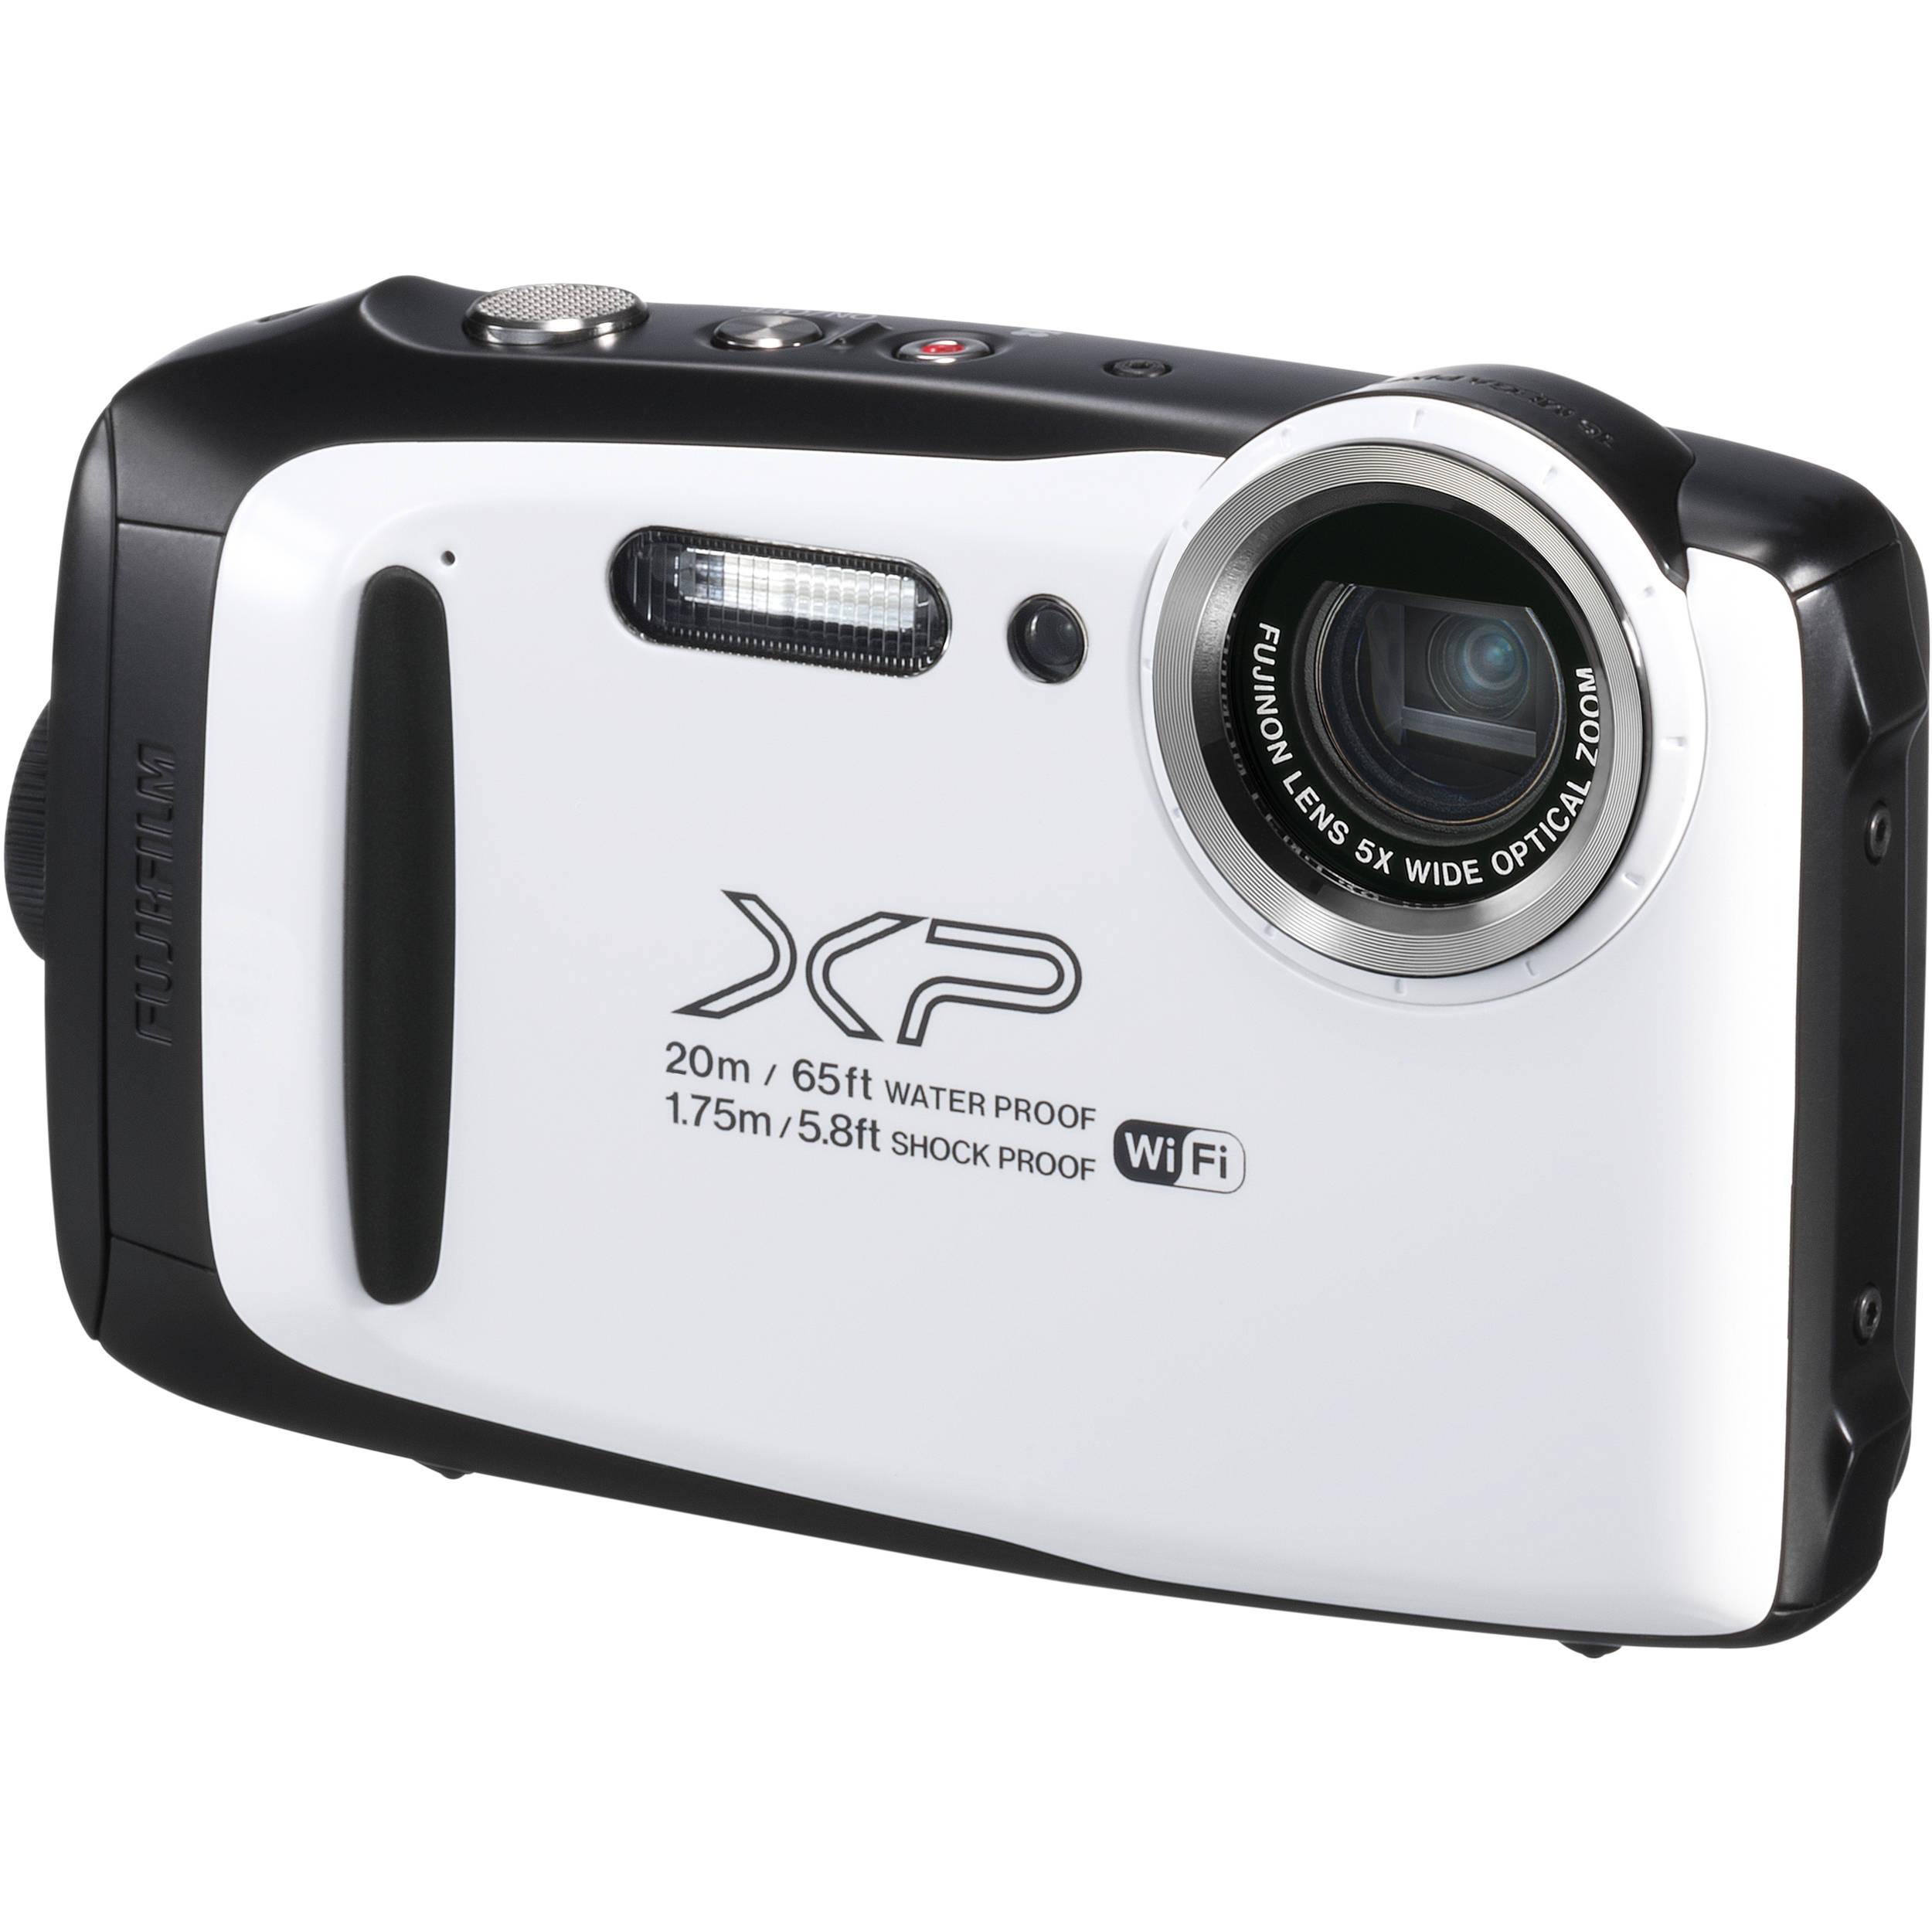 Fujifilm Finepix Xp130 Digital Camera White 600019827 B Amp H